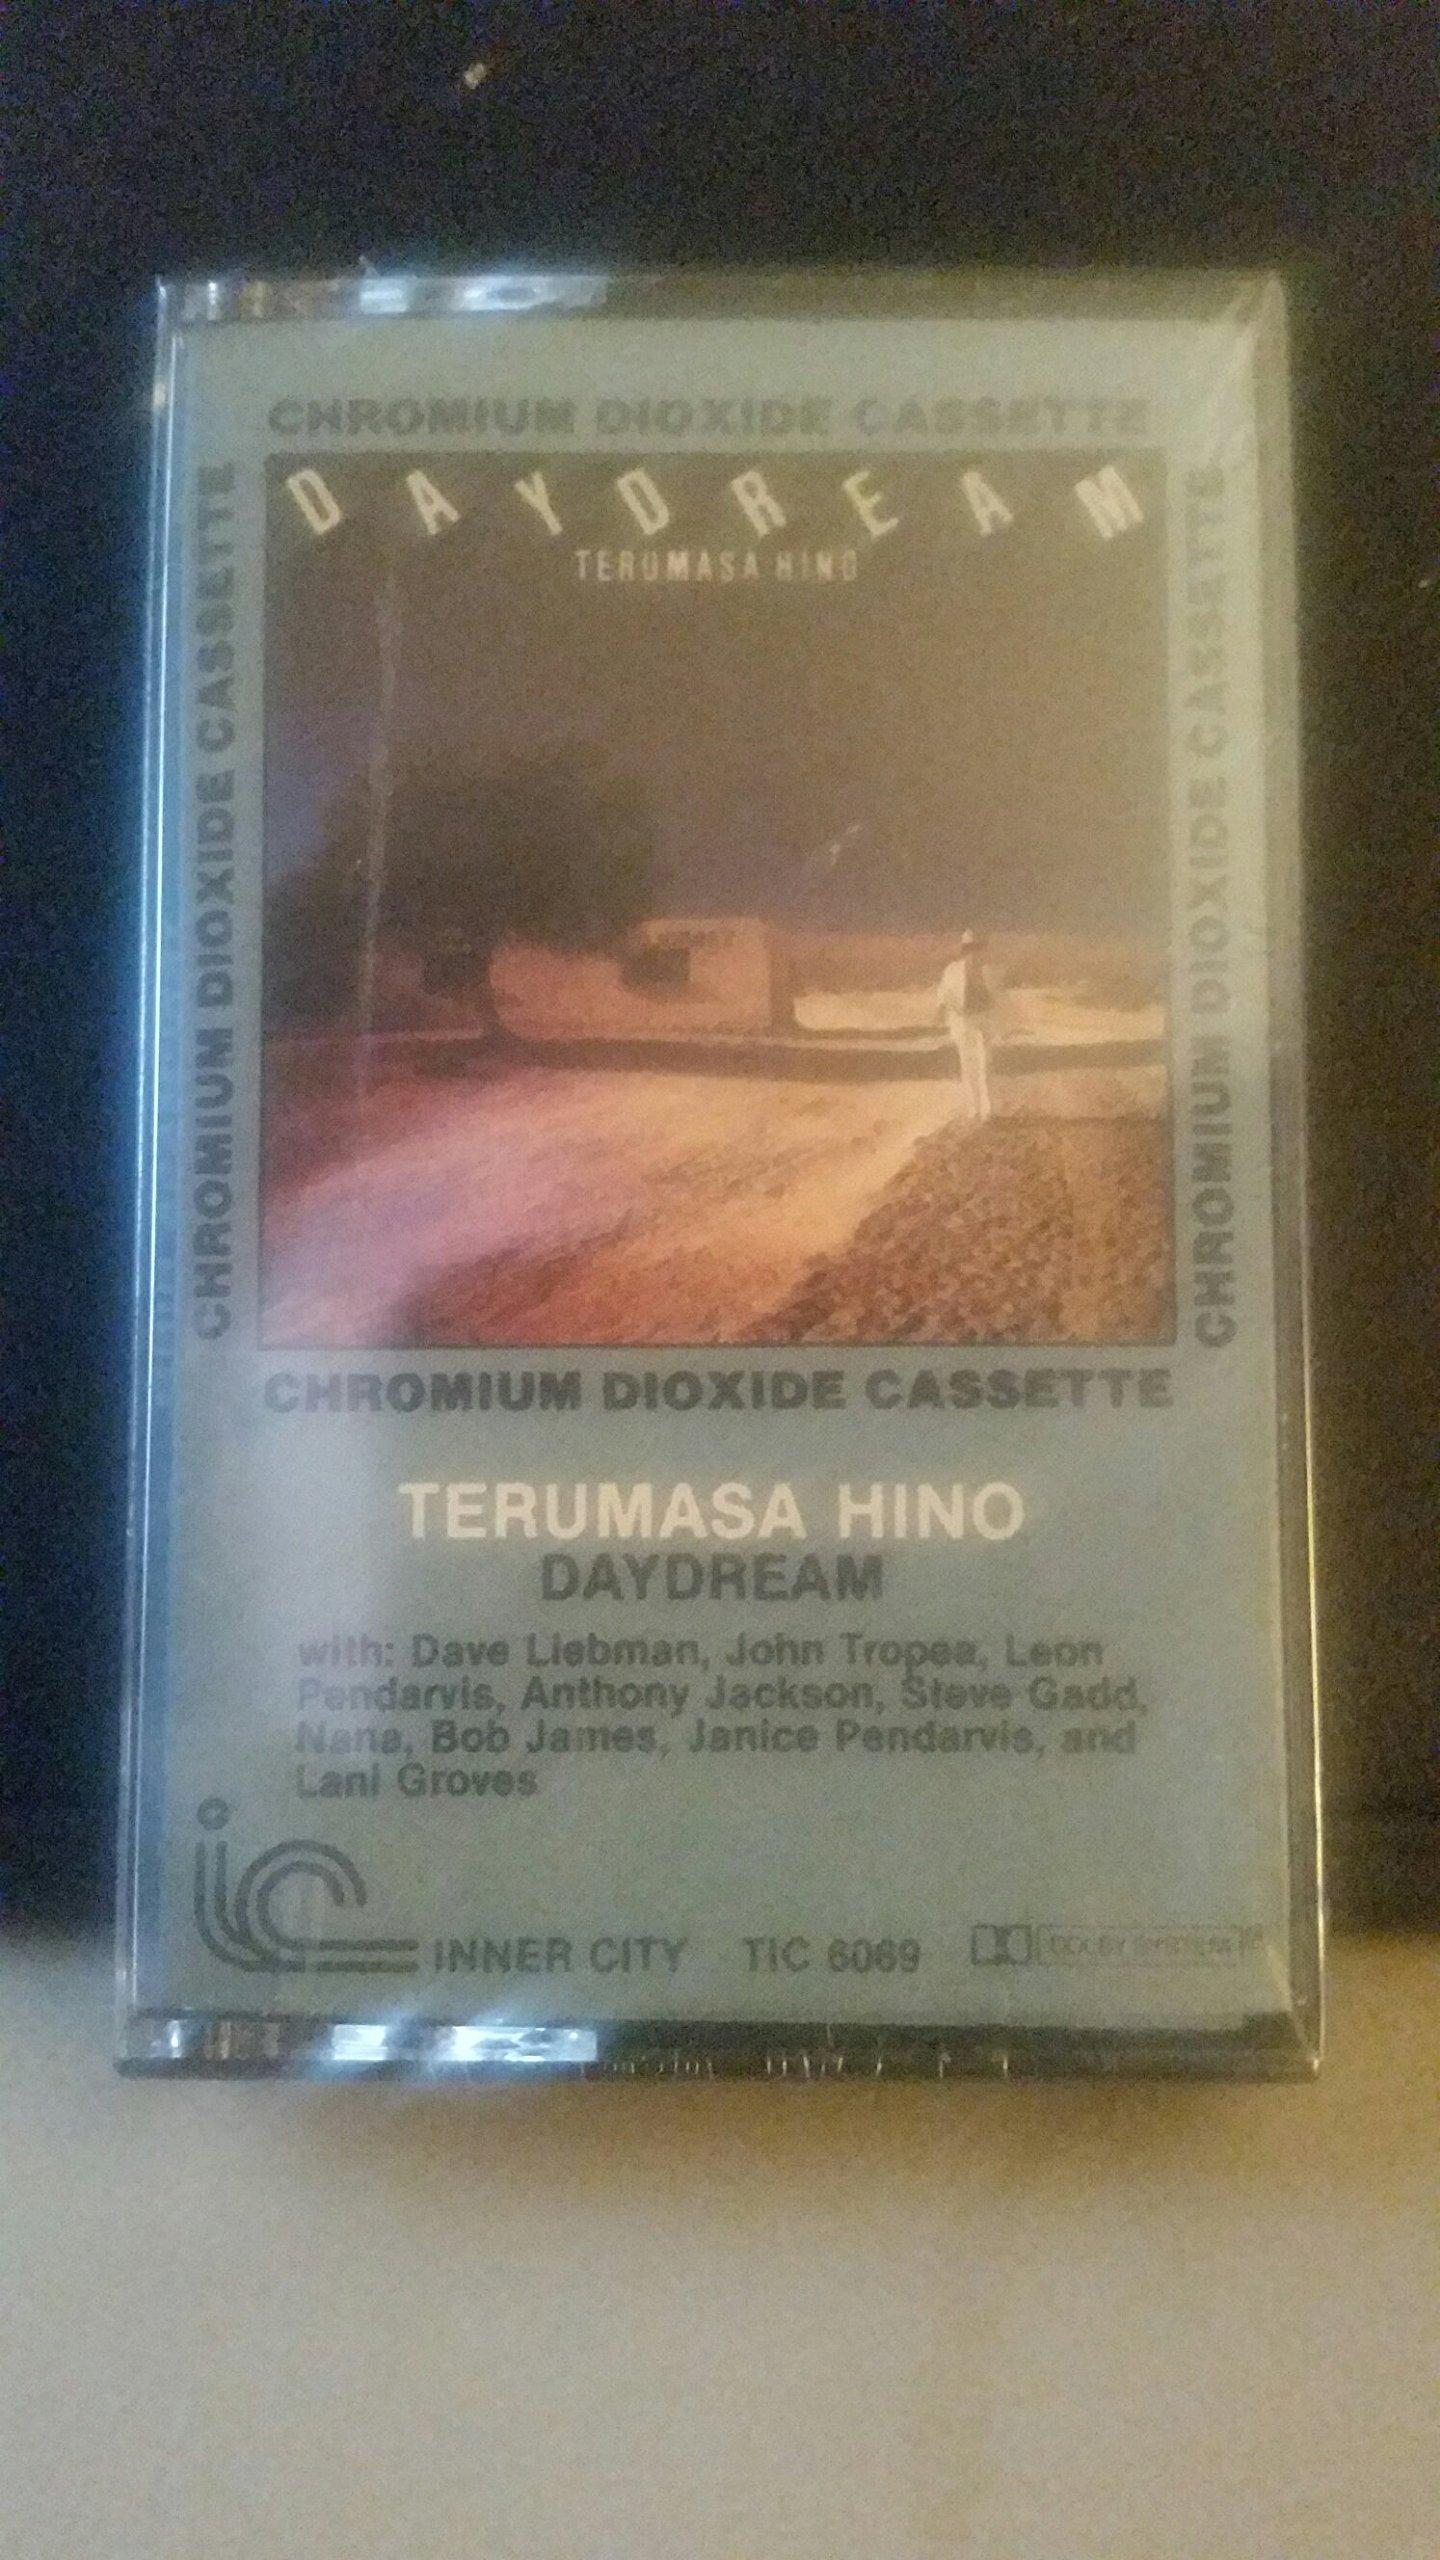 Daydream(W/James,Tropea) Audio, Cassette – March 31, 1981